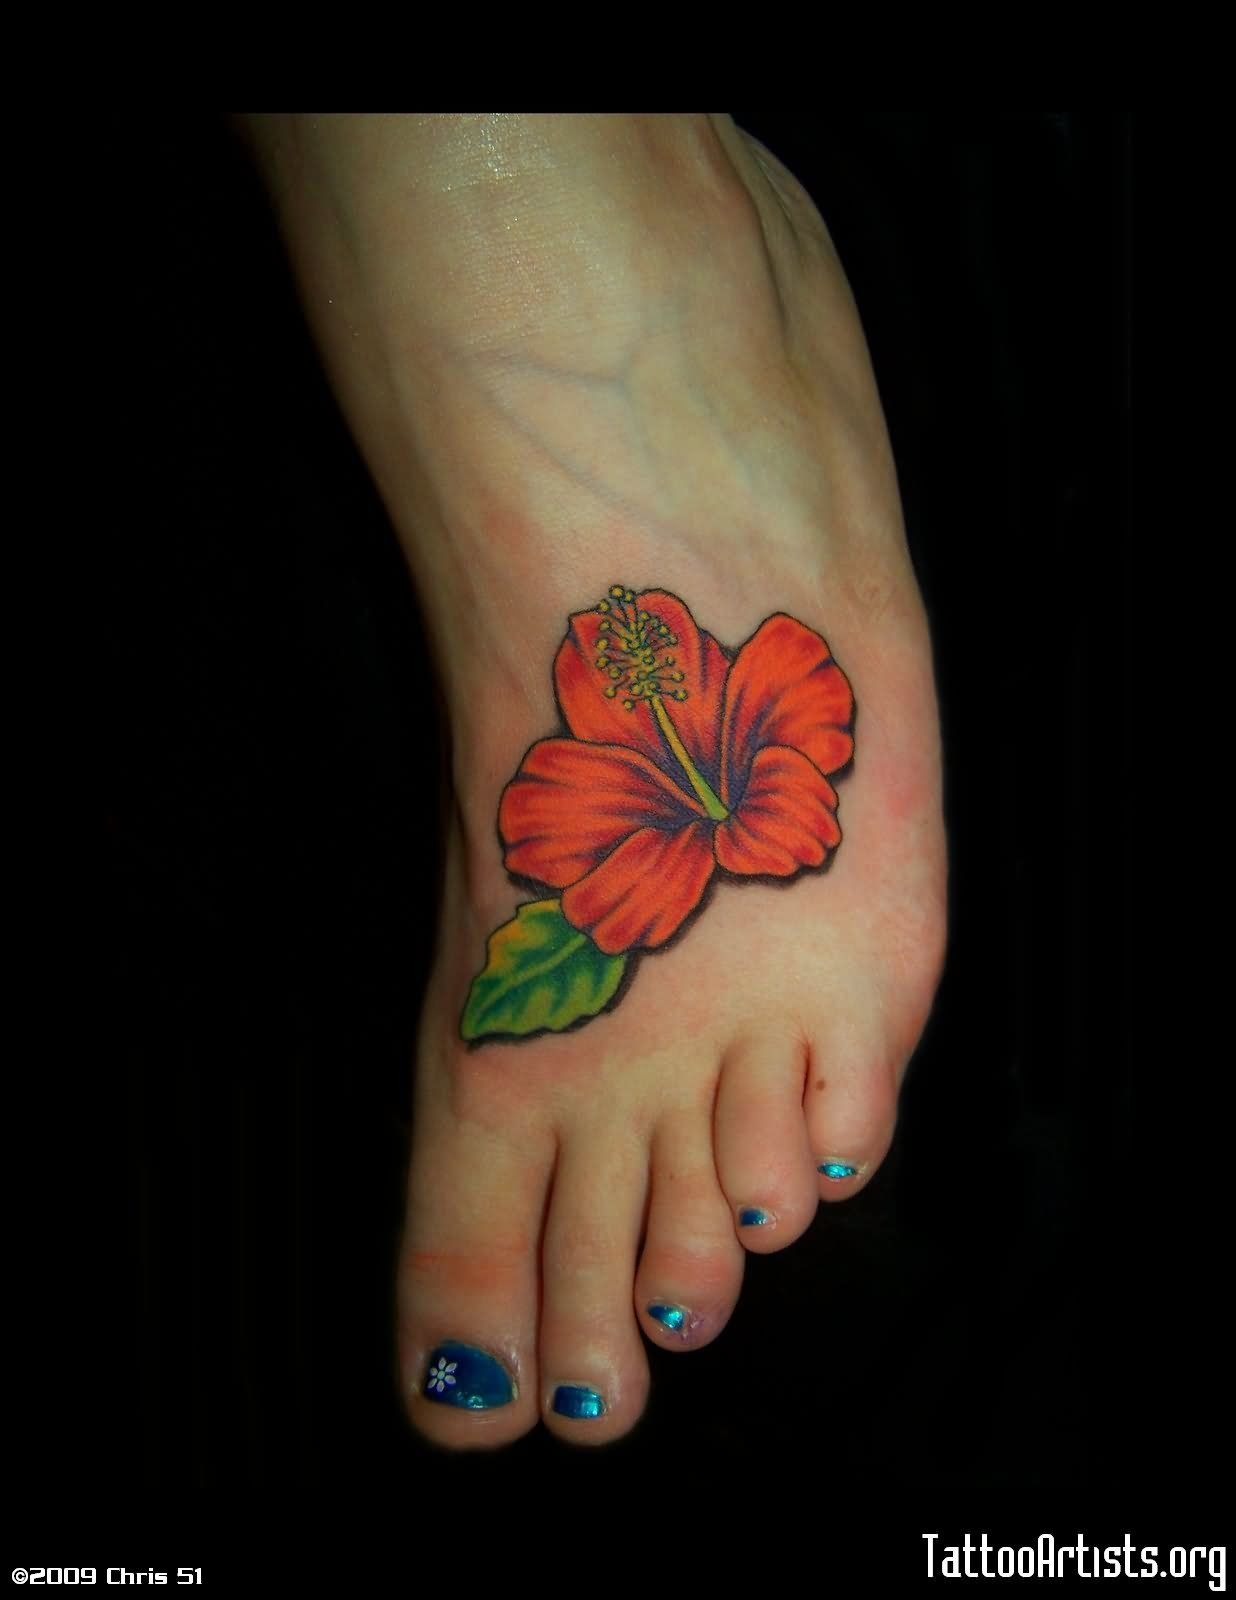 24 Hibiscus Flower Tattoos Designs Trends Ideas: Classic Hibiscus Flower Tattoo On Girl Left Foot By Chris